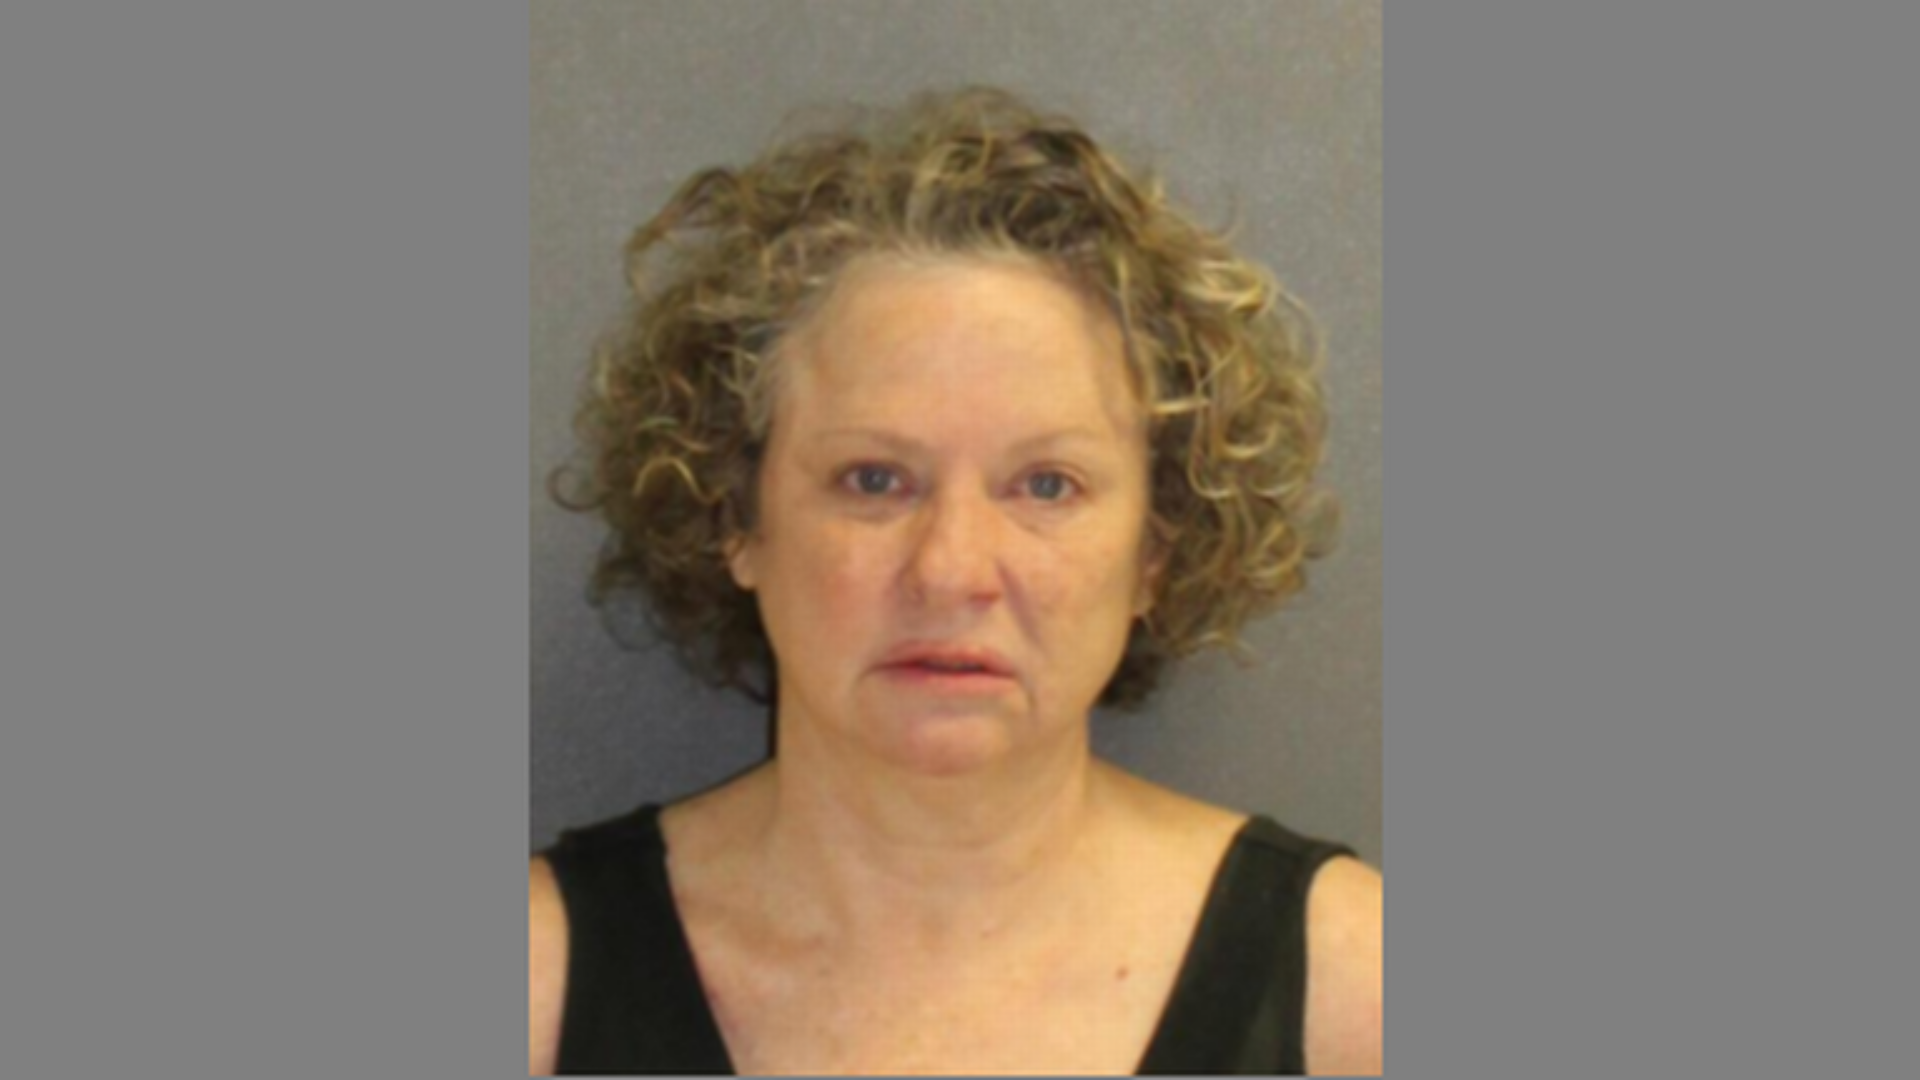 'My KKK Friends Will Burn Your Family': White Woman Captured On Body Cam Audio Threatening Black Officer